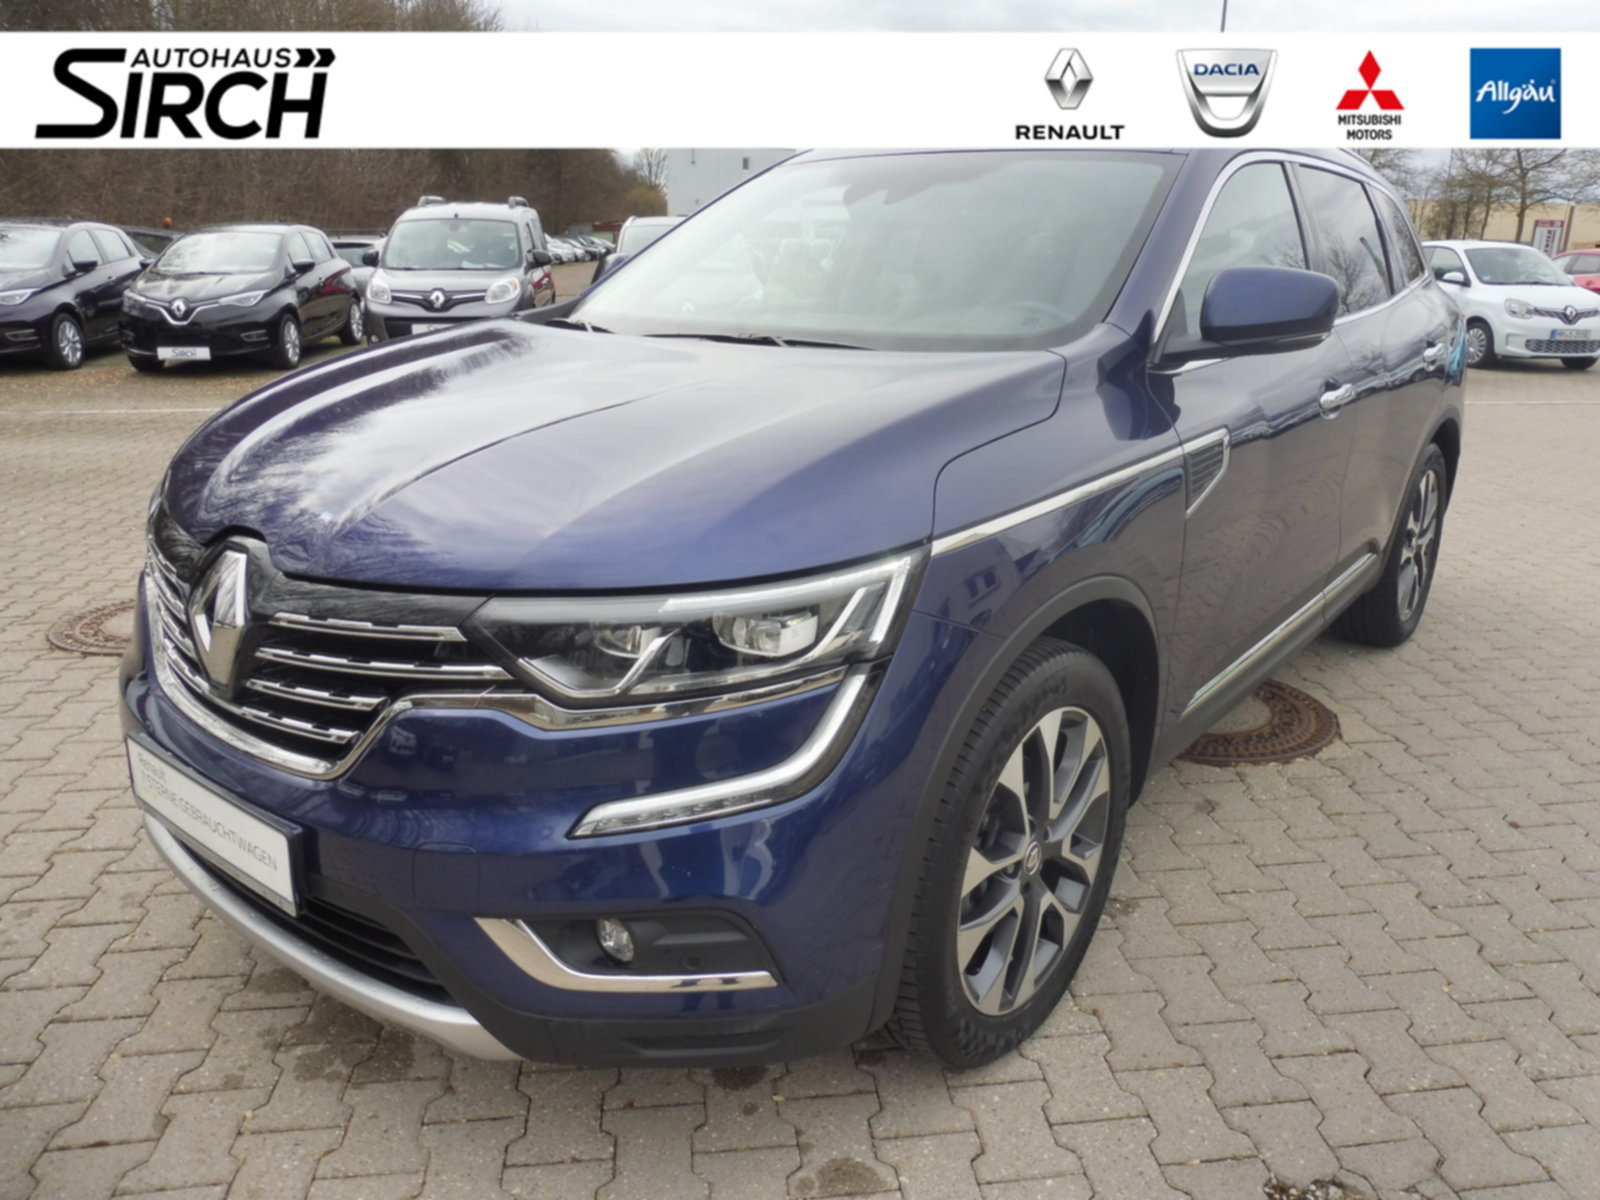 Renault Koleos LIMITED 4x4 dCi 175 EDC, Jahr 2018, Diesel